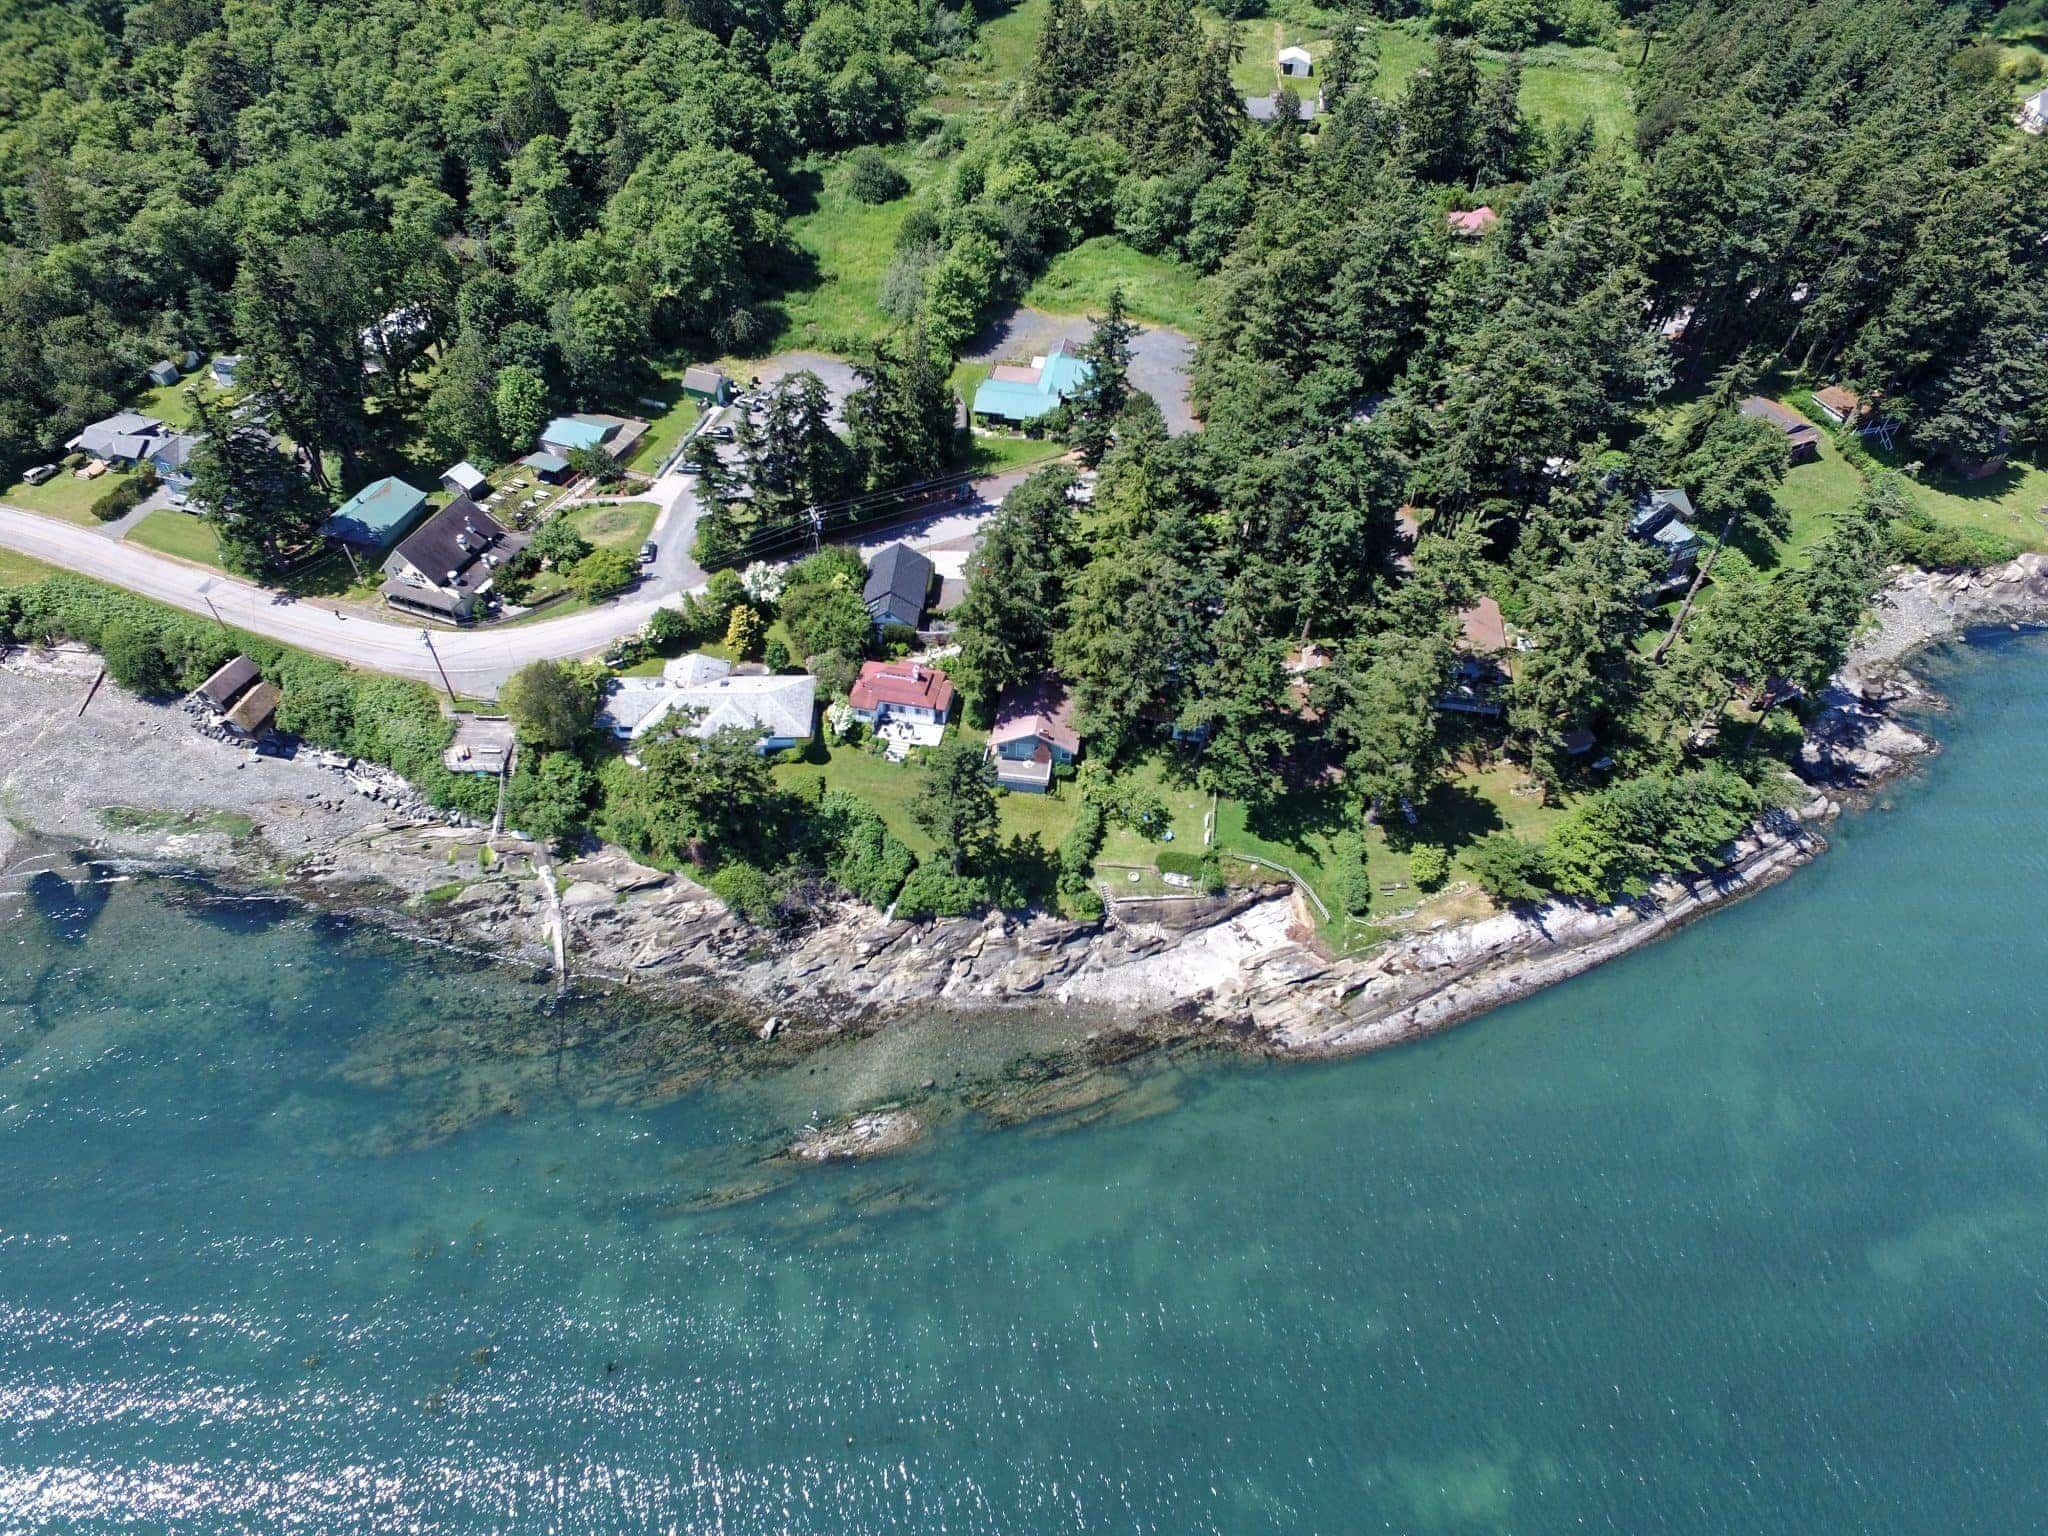 Beach house from the air